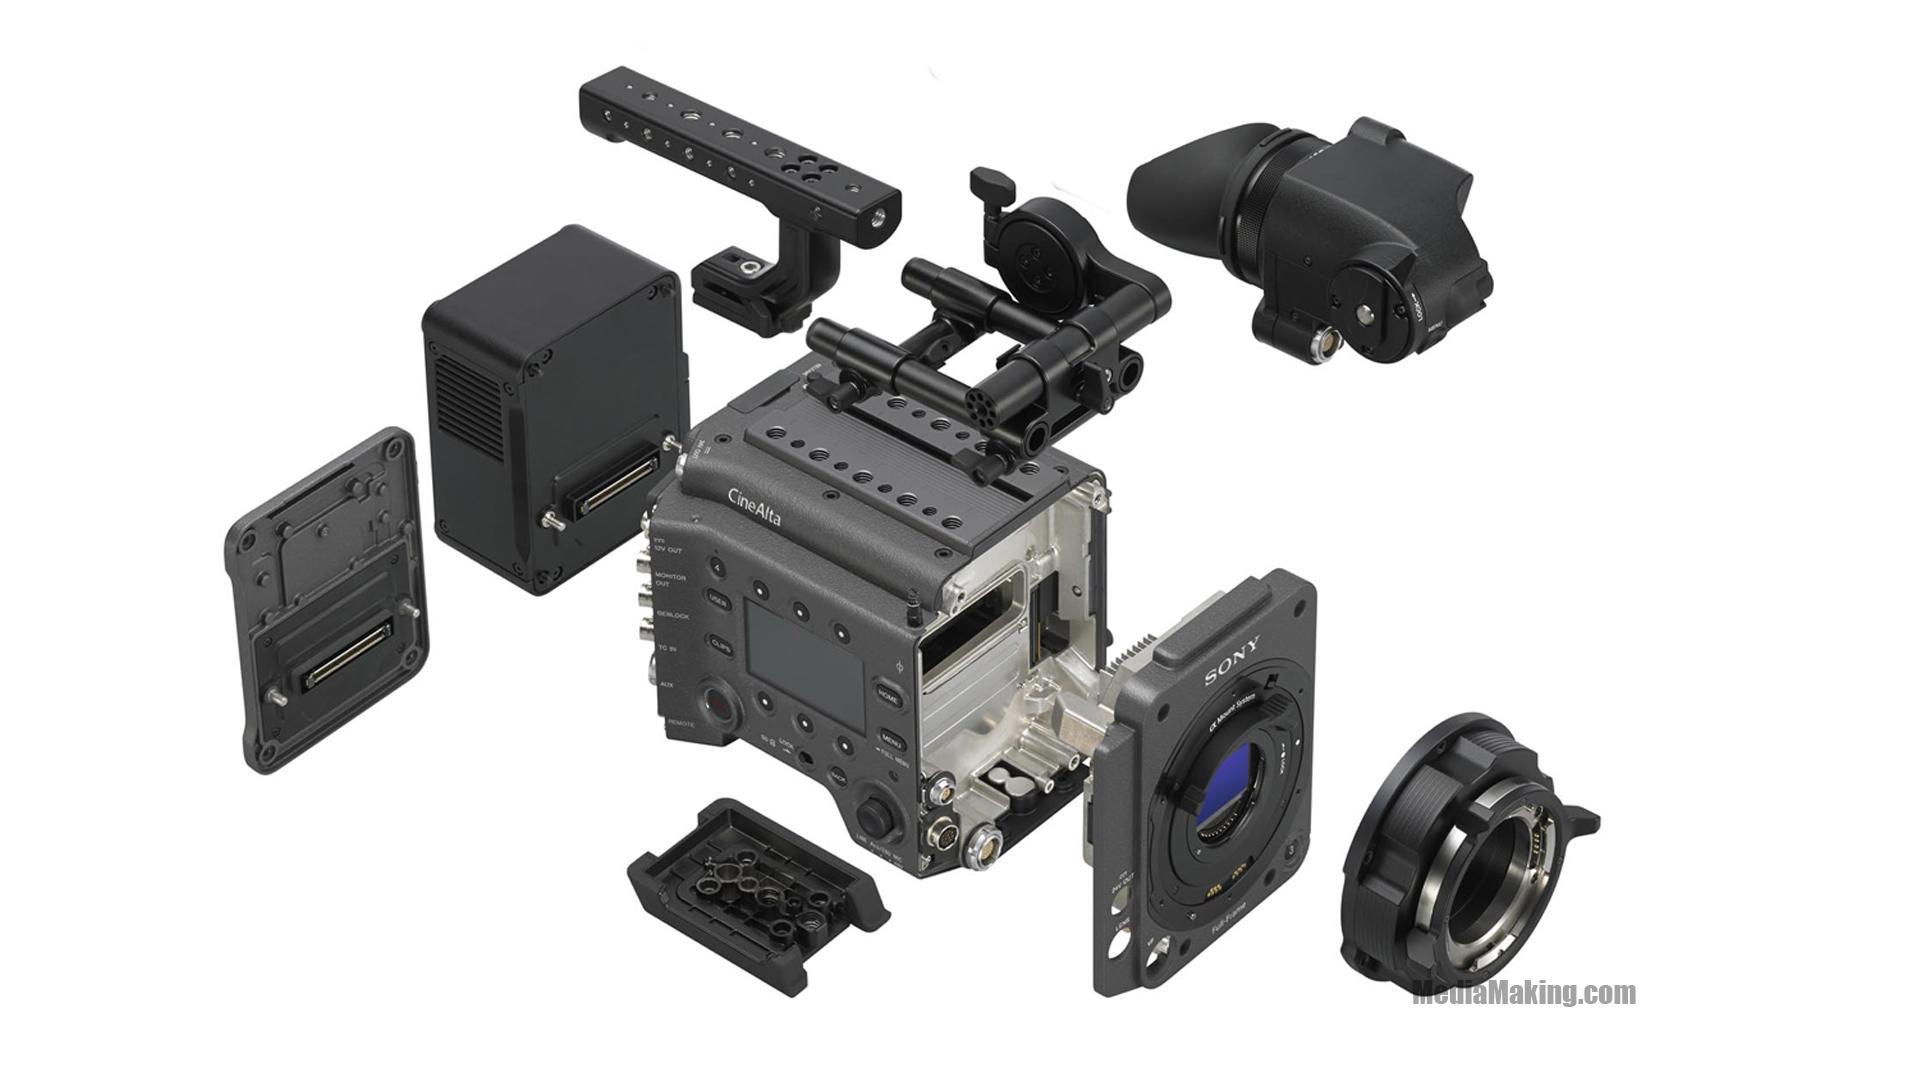 sony venice, Sony Venice CineAlta 6K, MediaMaking